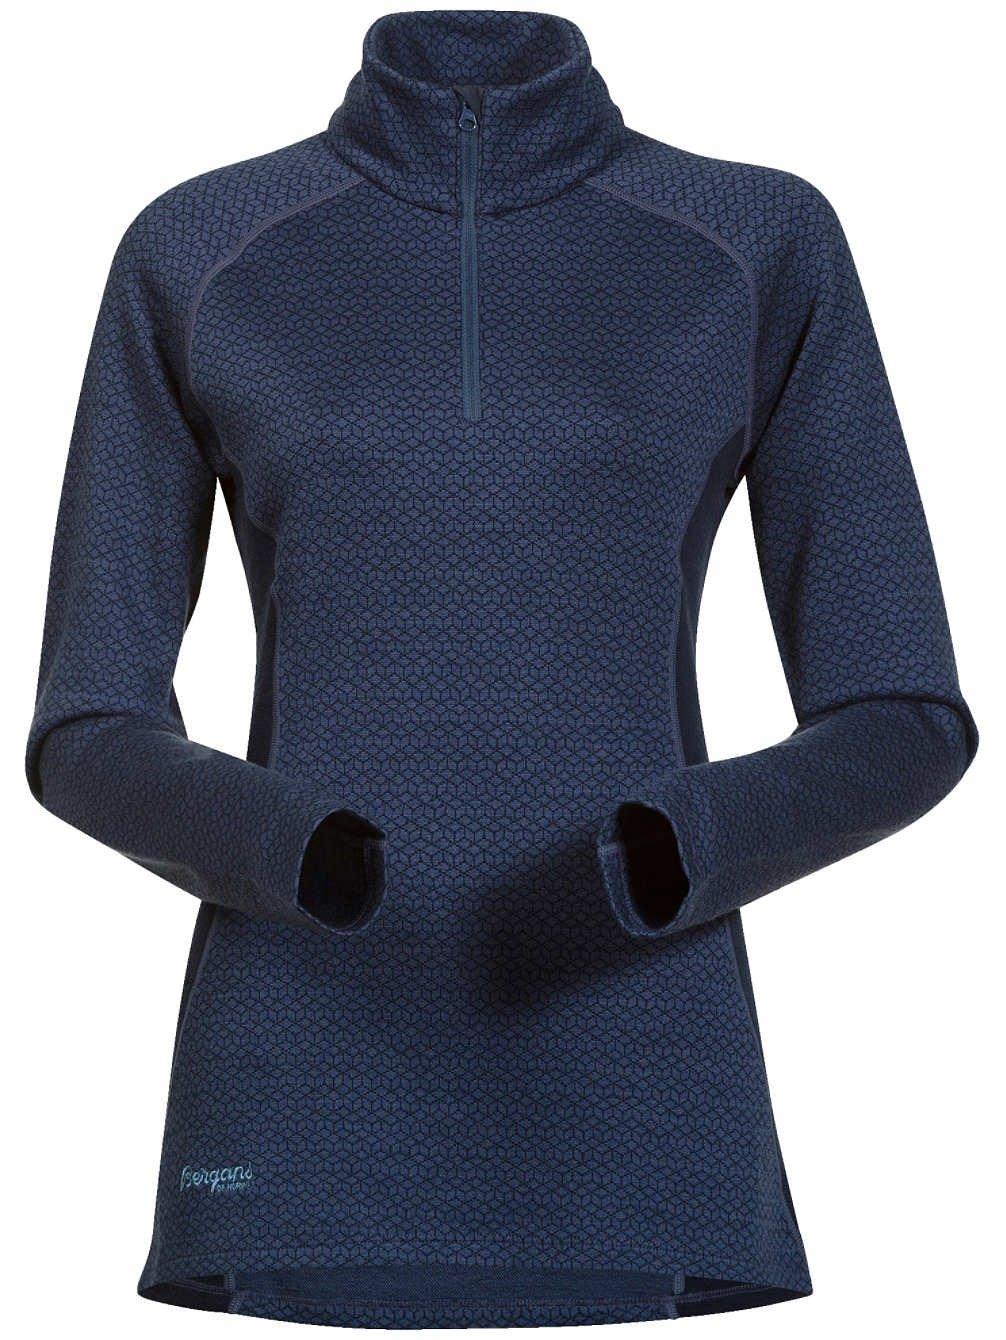 Bergans Snoull Lady Half Zip Longsleeve Shirt - 290er Merinowolle Thermounterwäsche